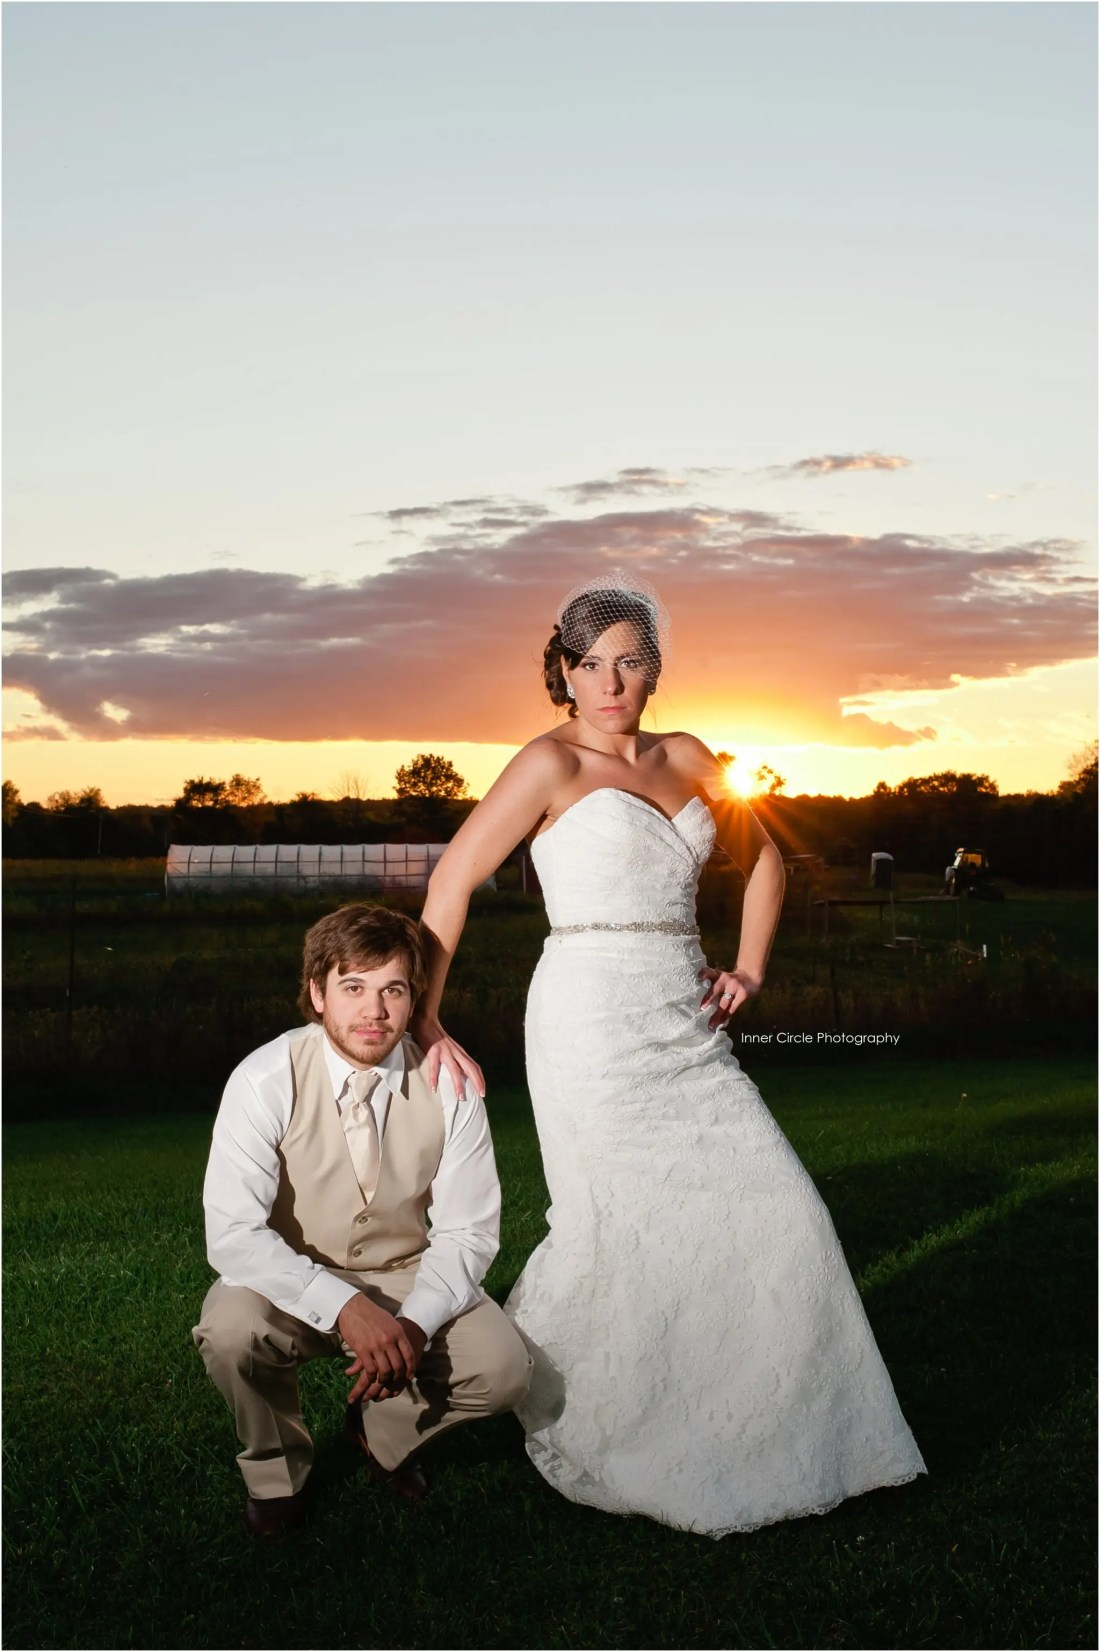 justinbrandyWED487 Brandy and Justin MARRIED! Upland Hills Farm Wedding